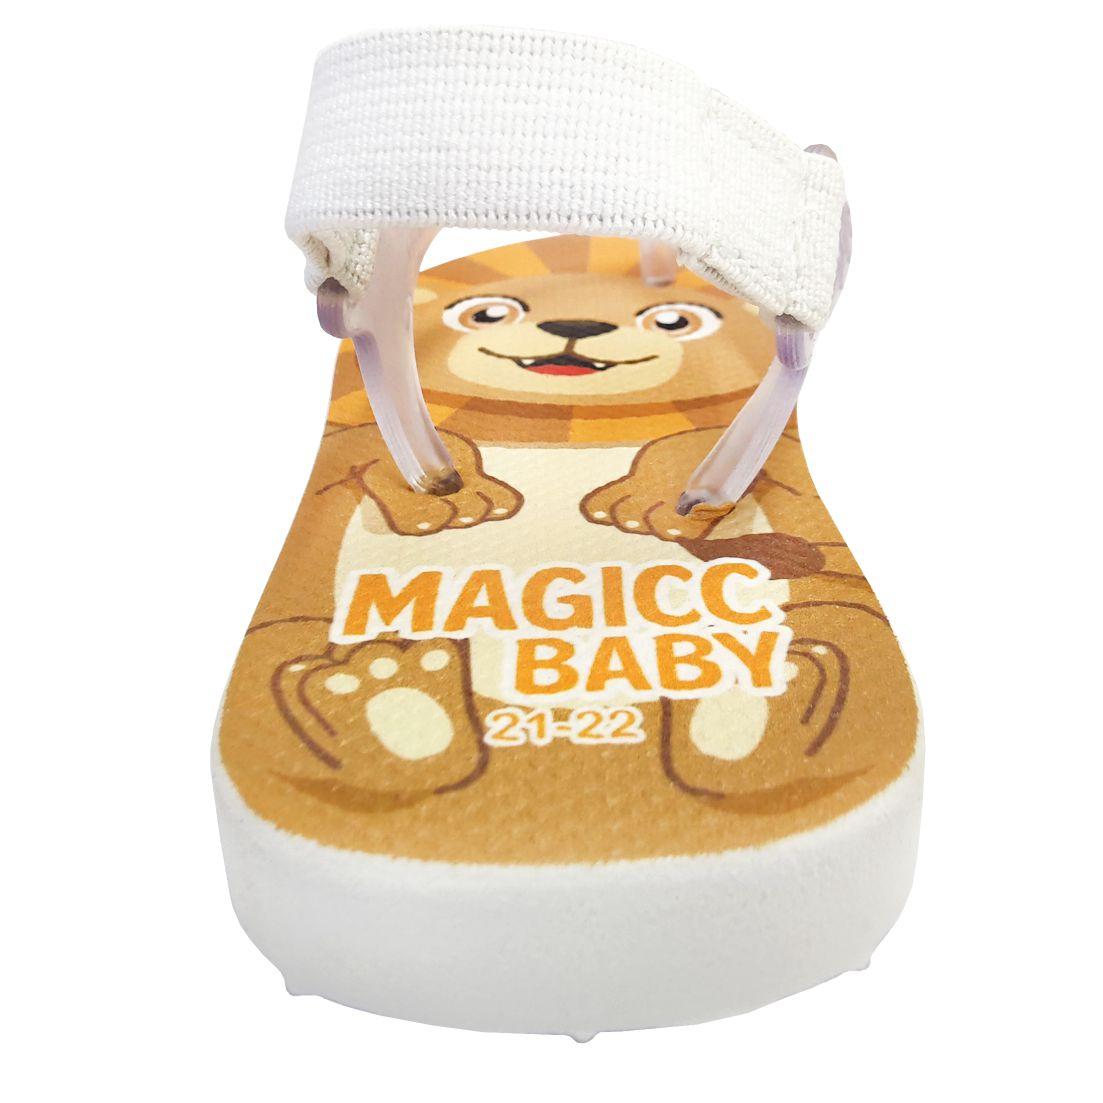 Chinelo Menino Bebê Sandália Leãozinho Magicc Baby